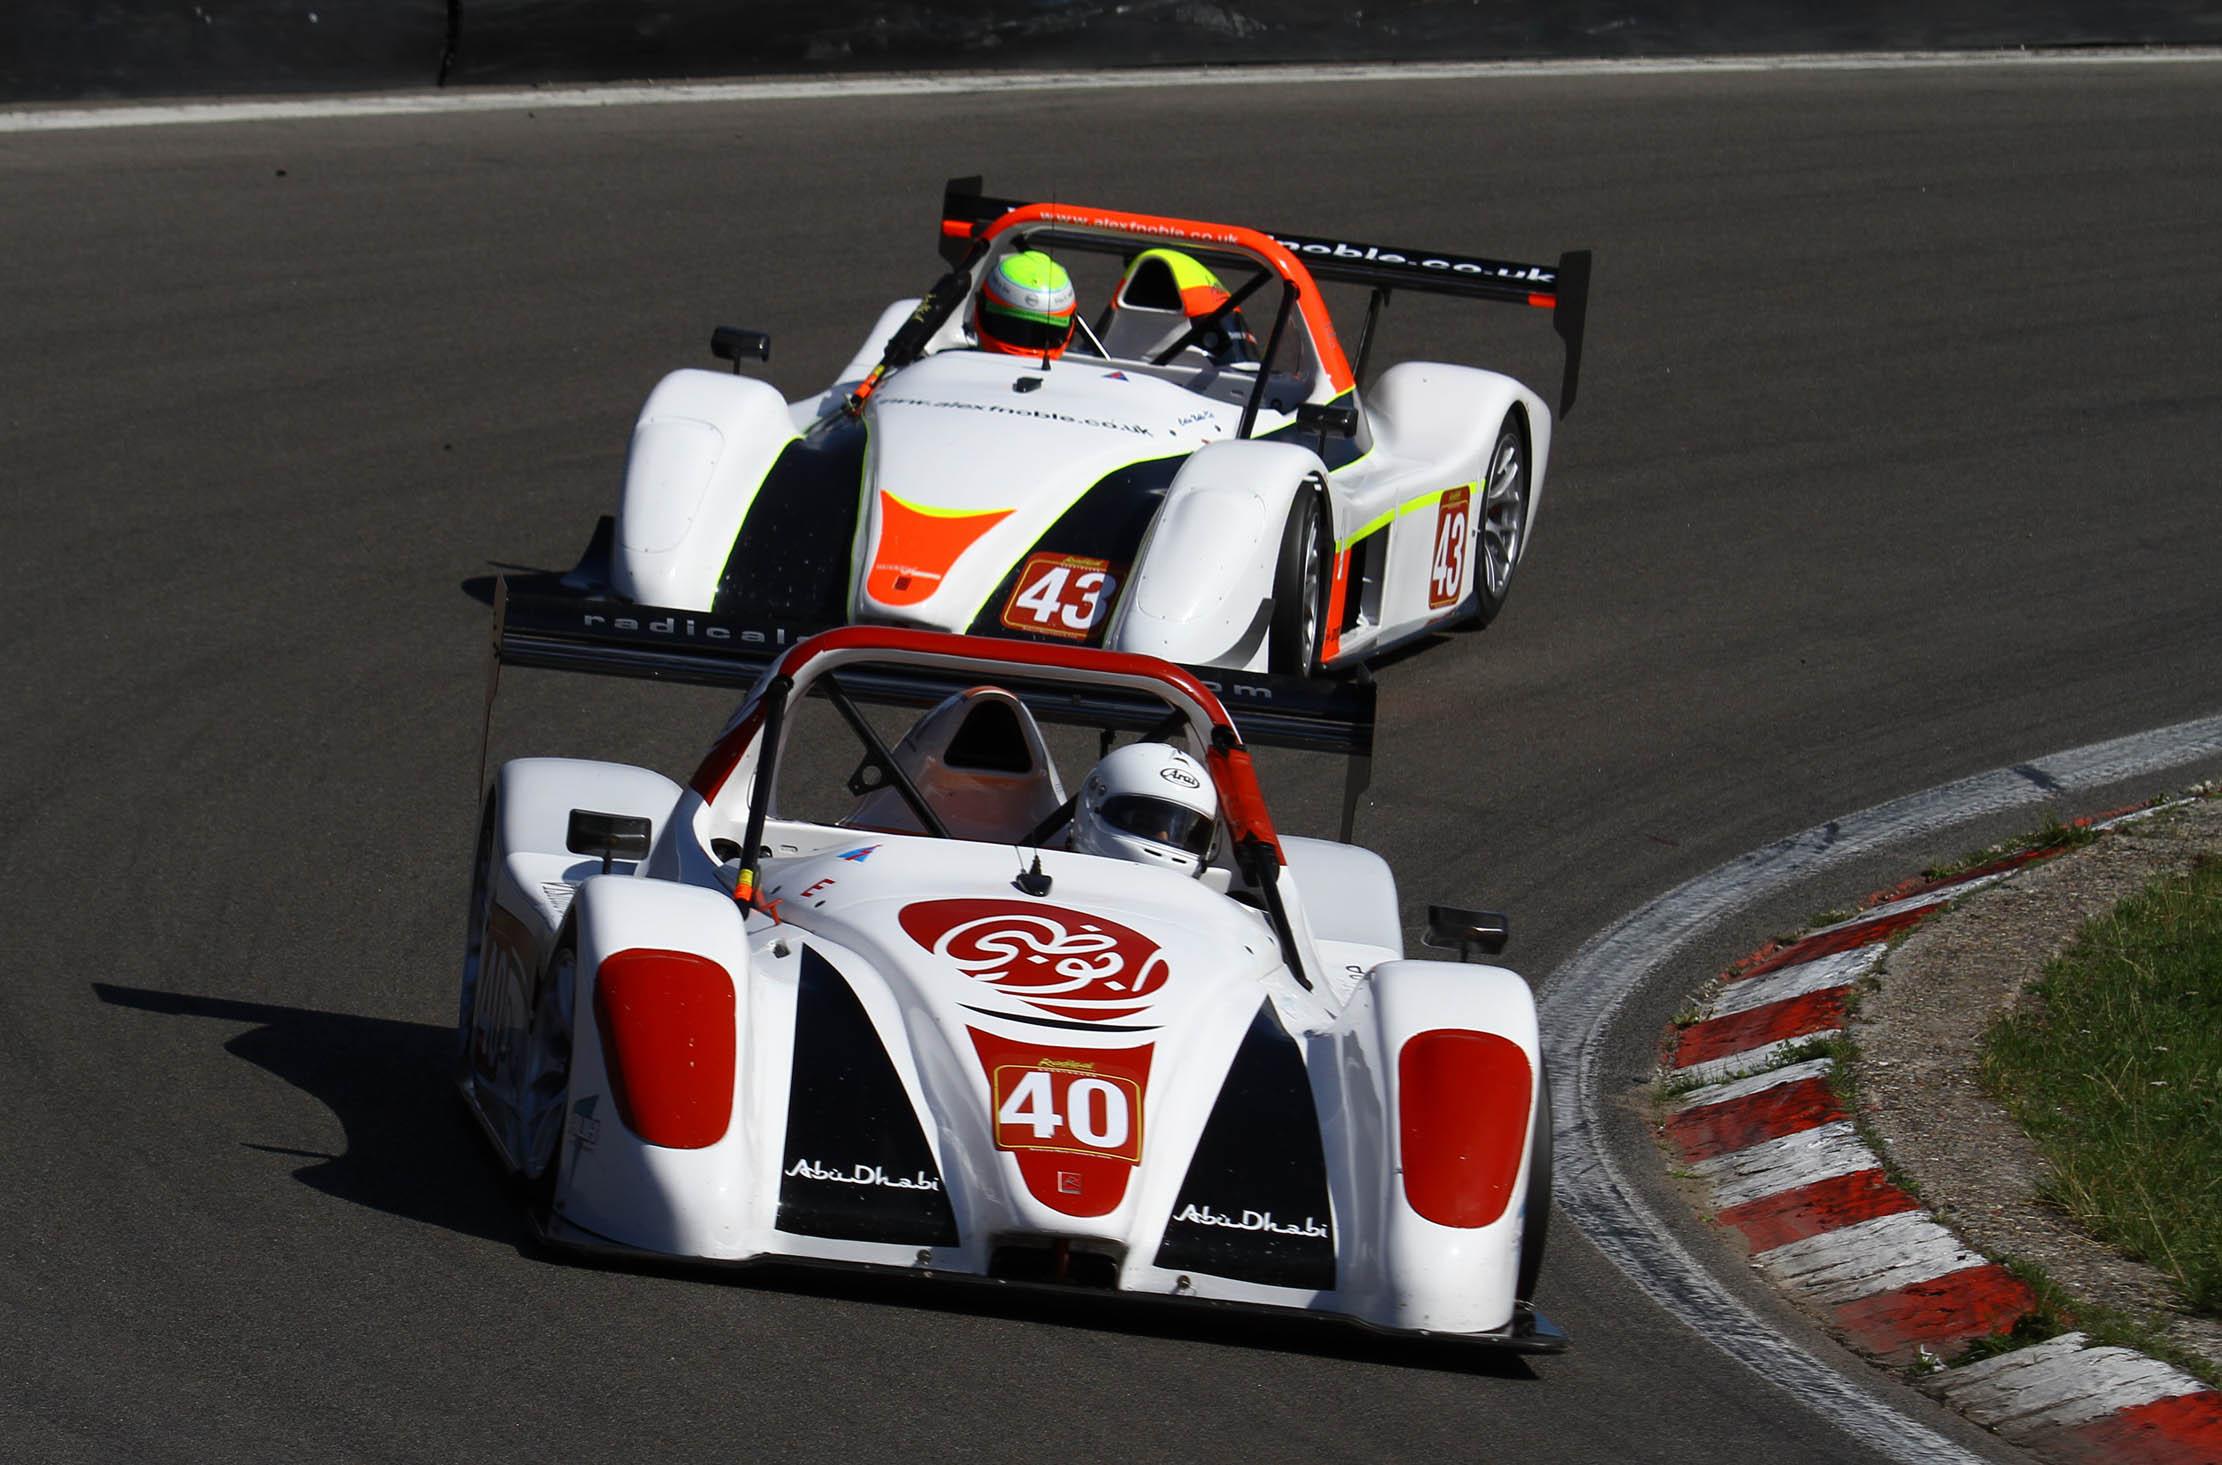 ADTA driver Jassim Al Shamsi battles in his toughest Radical Masters race at Hungaroring